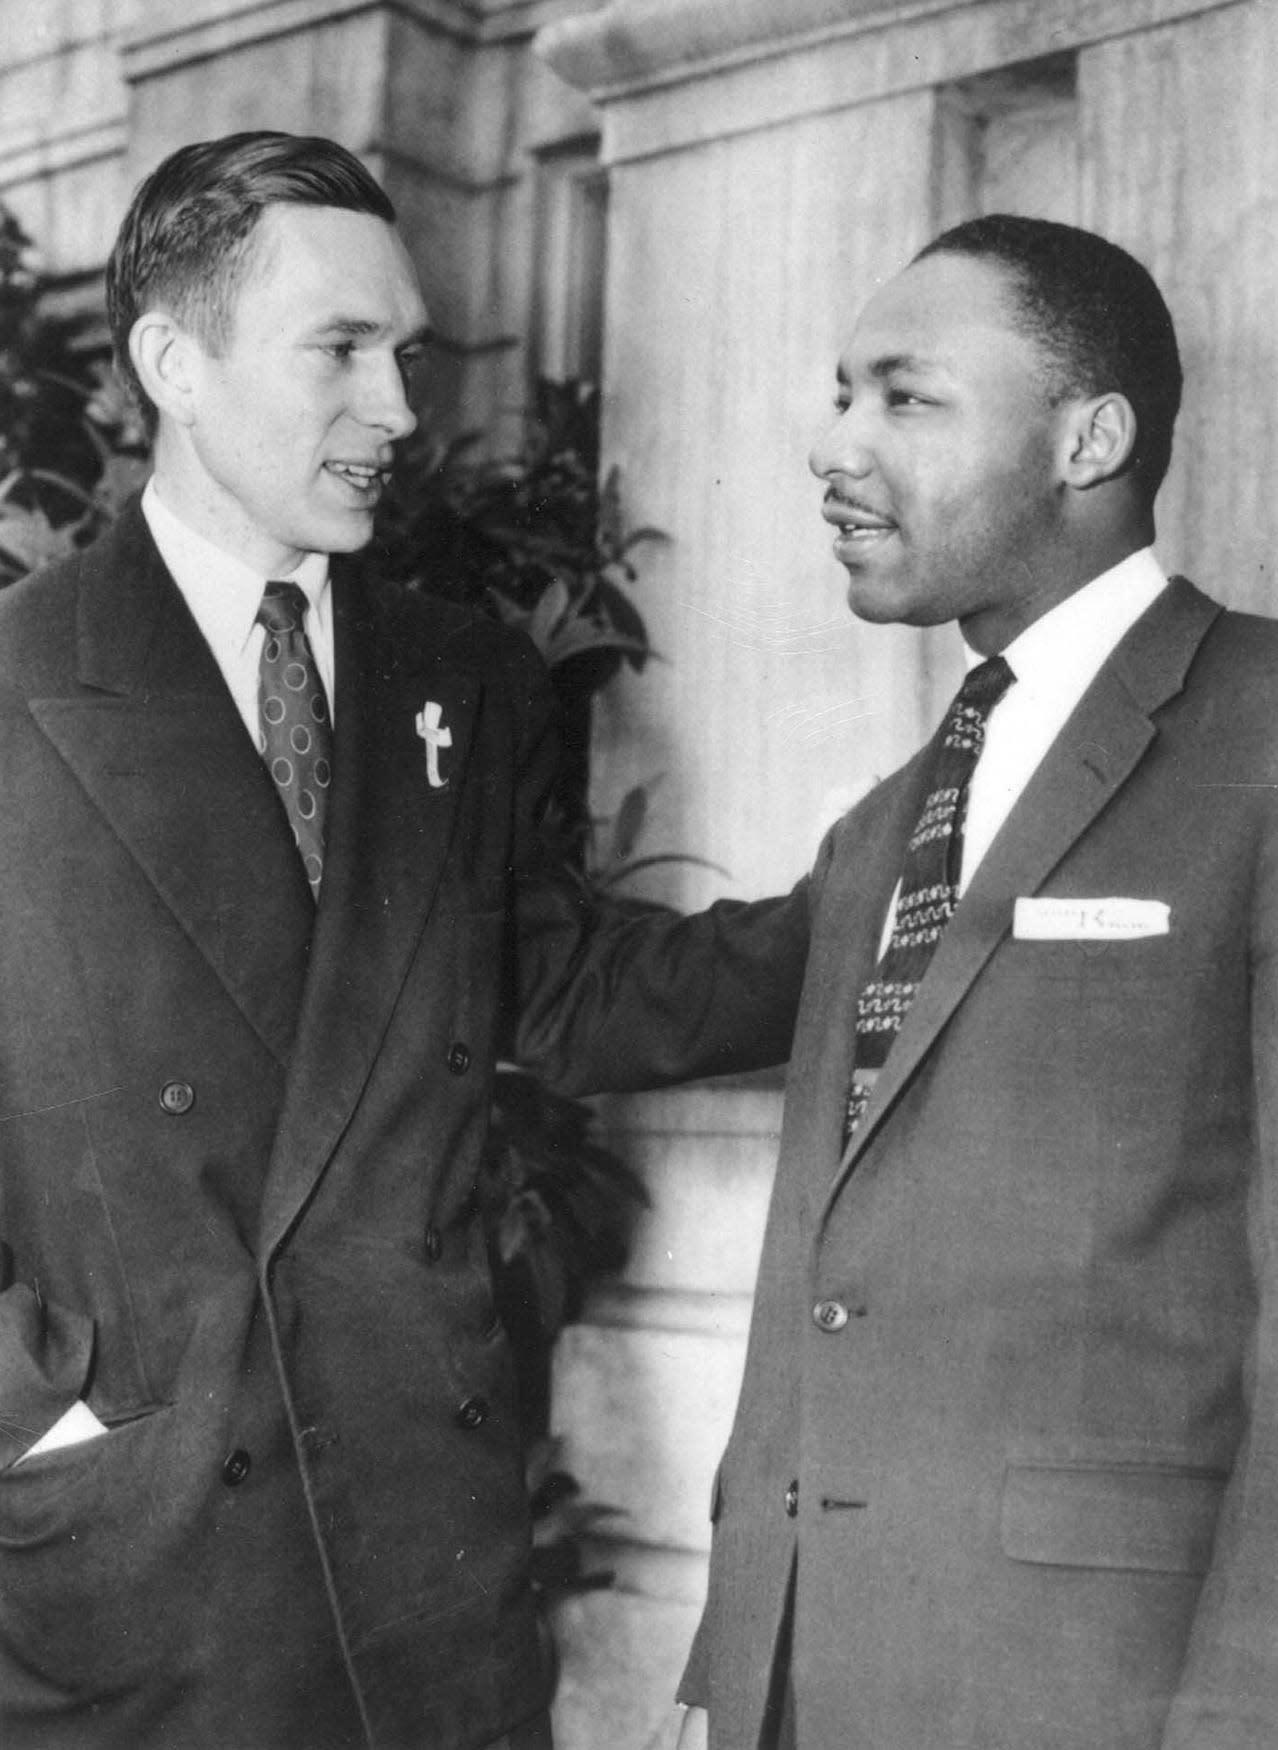 Robert Graetz, the white minister who helped organize 1950s Montgomery Bus Boycott, dies at 92